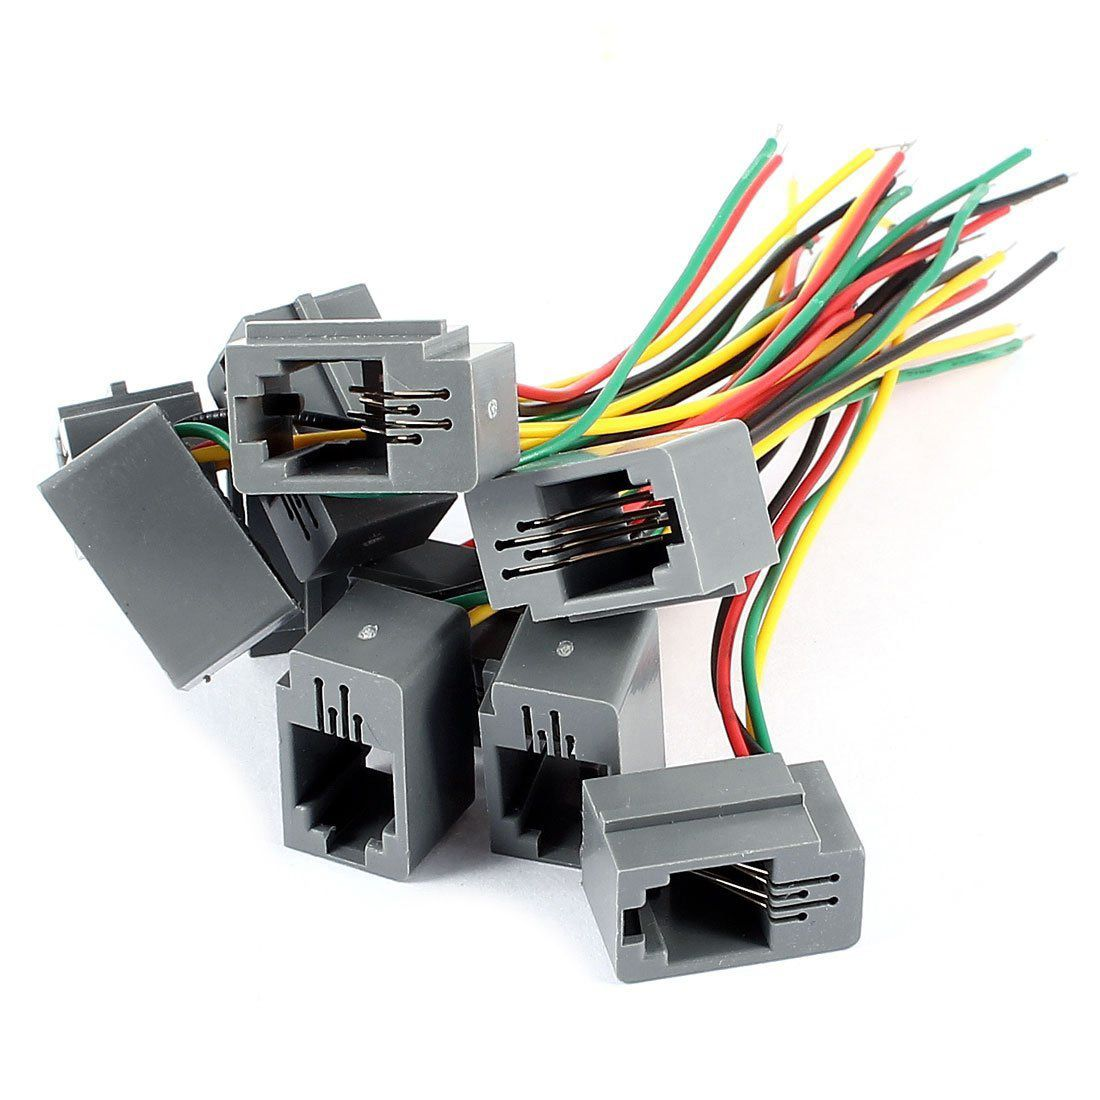 ksol 10 pcs 616e 4p4c rj9 female telephone connector adapter w 4 wires 8cm affiliate [ 1100 x 1100 Pixel ]